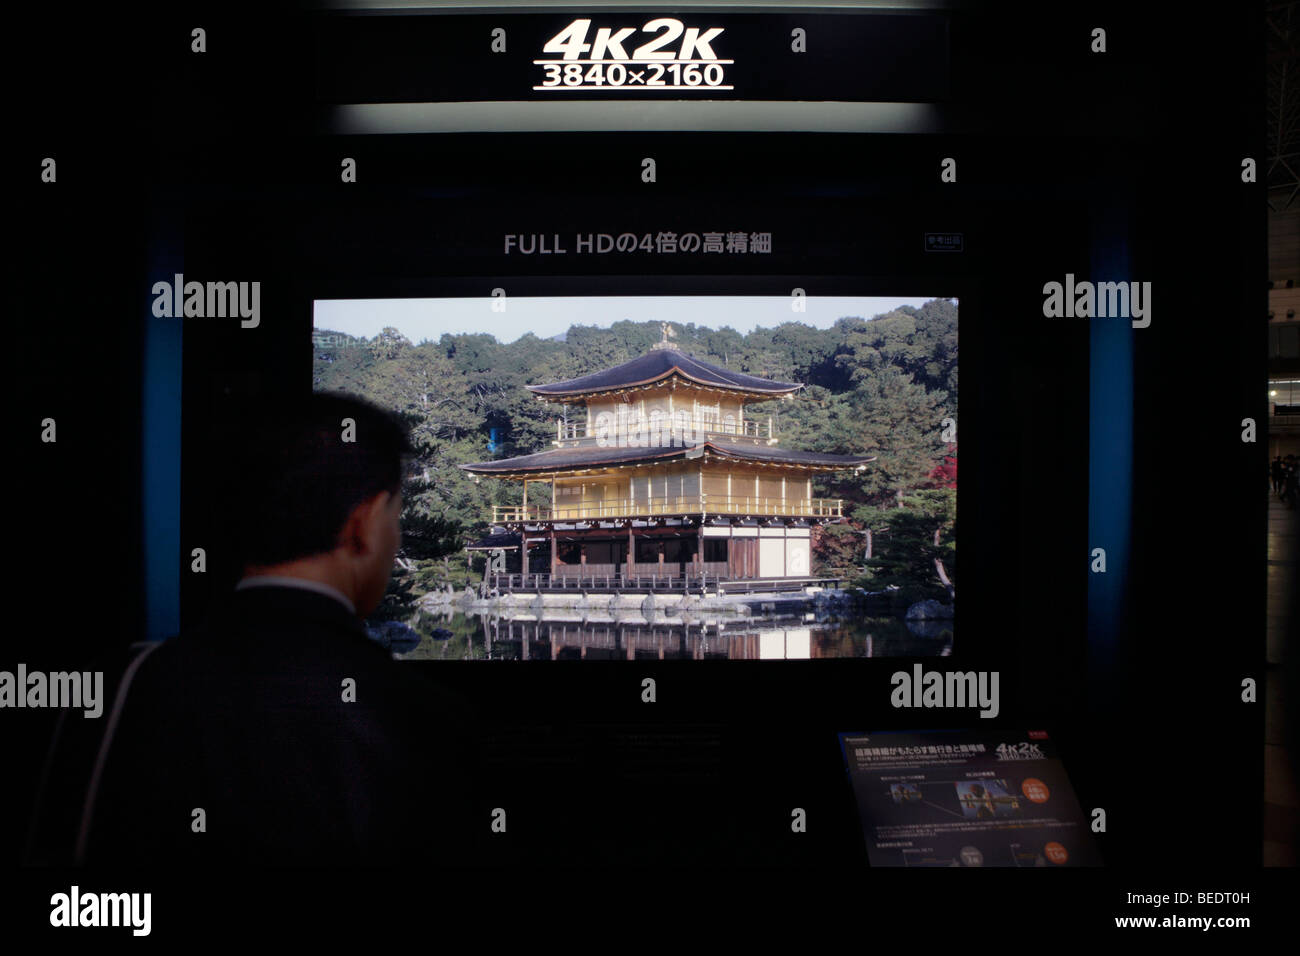 Panasonic FULL HD 3D television viewers - Stock Image